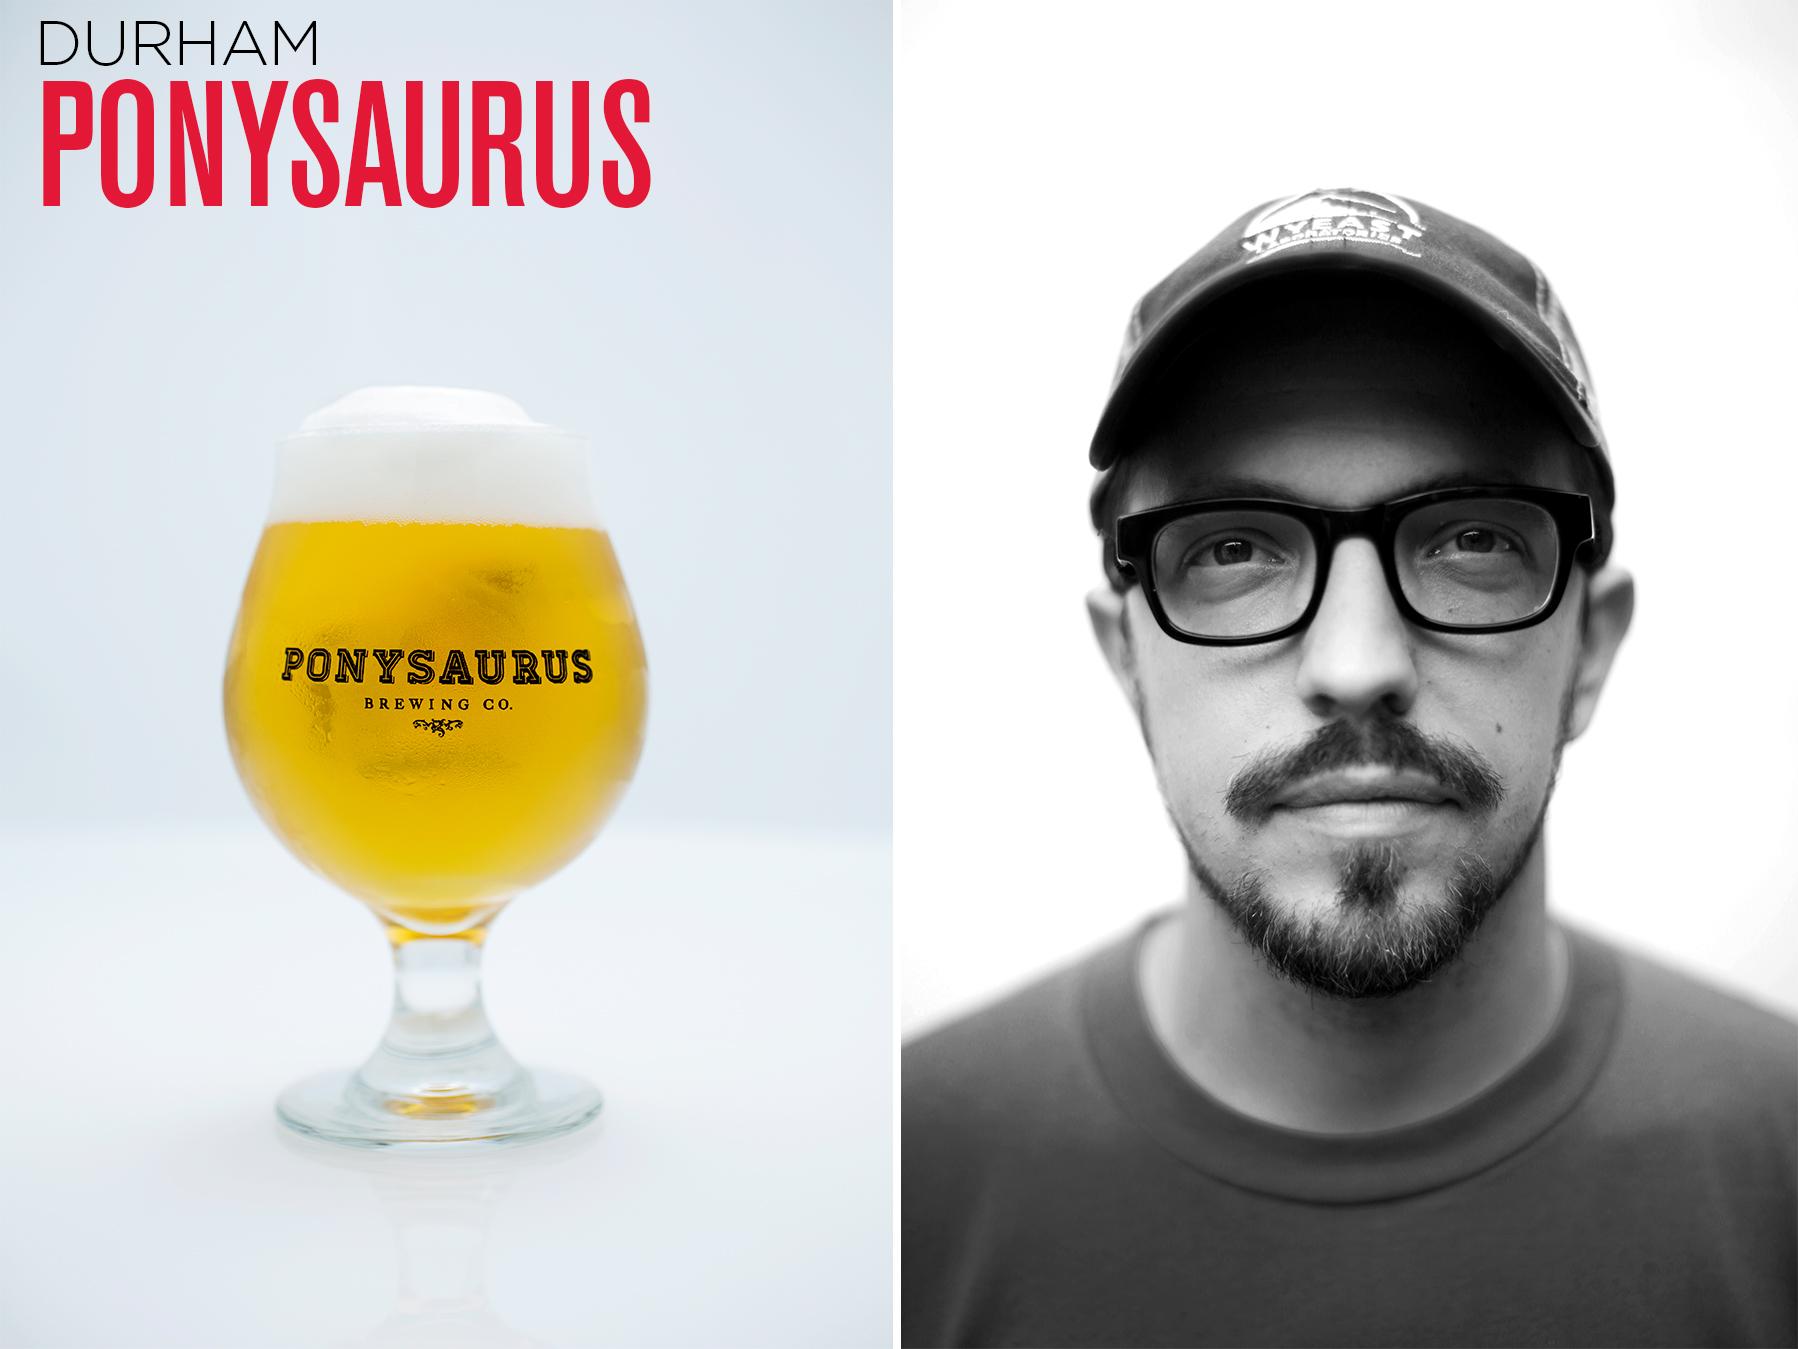 ponysaurus-durham